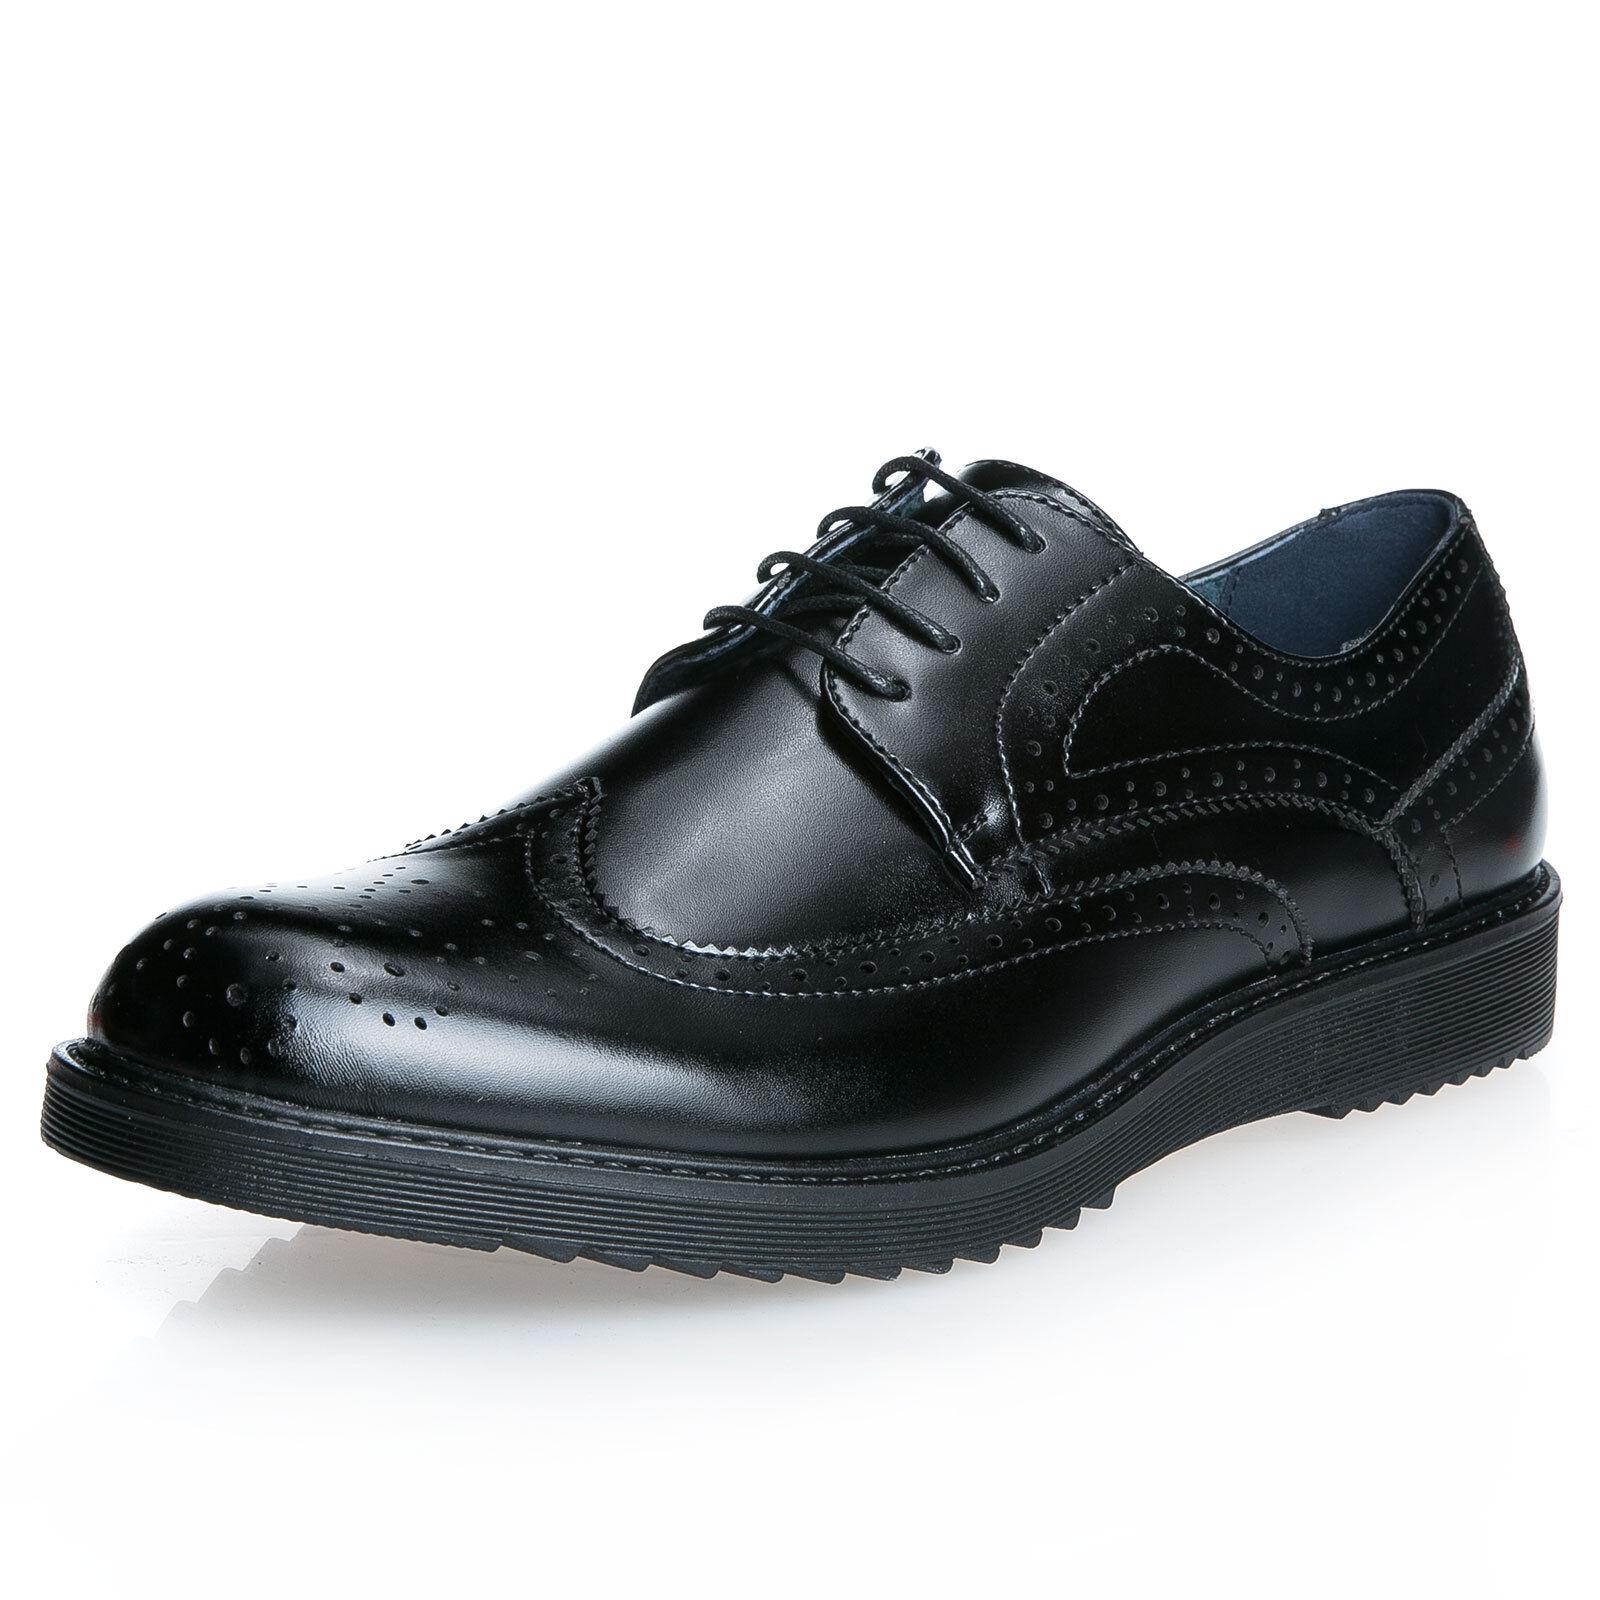 scarpe uomo classiche eleganti francesine 40 41 42 43 44 45 ingrosso ... 7010d31f864